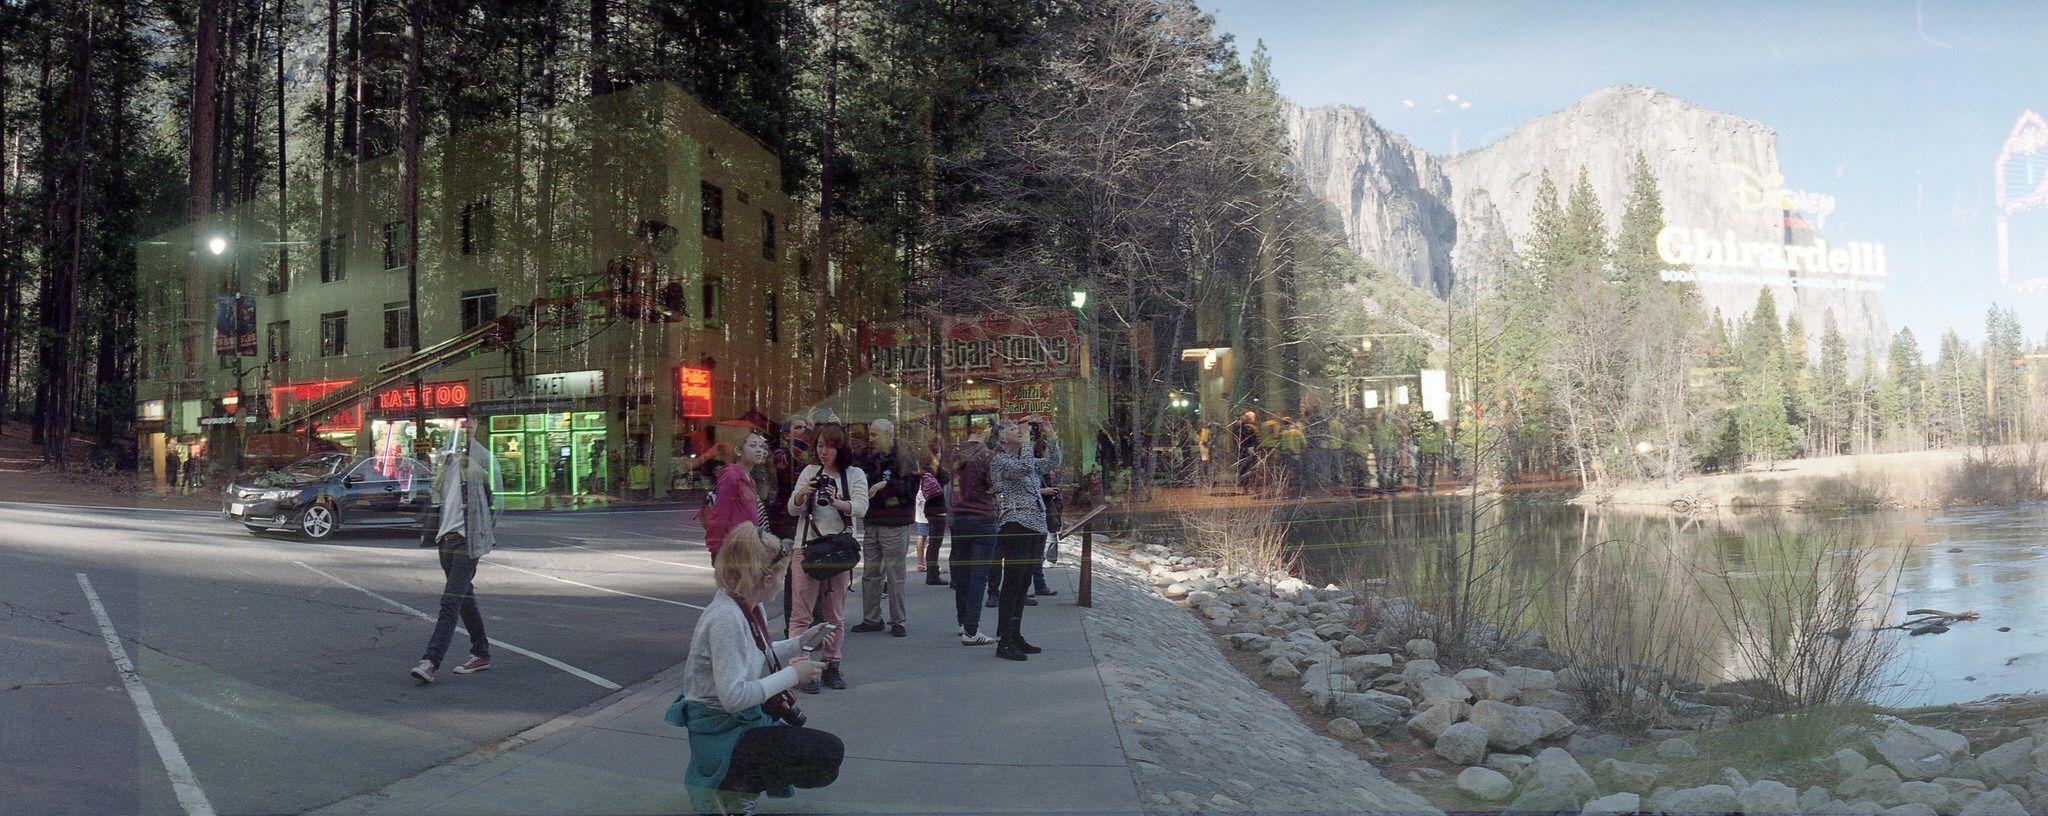 Yosemite meets Hollywood Blvd